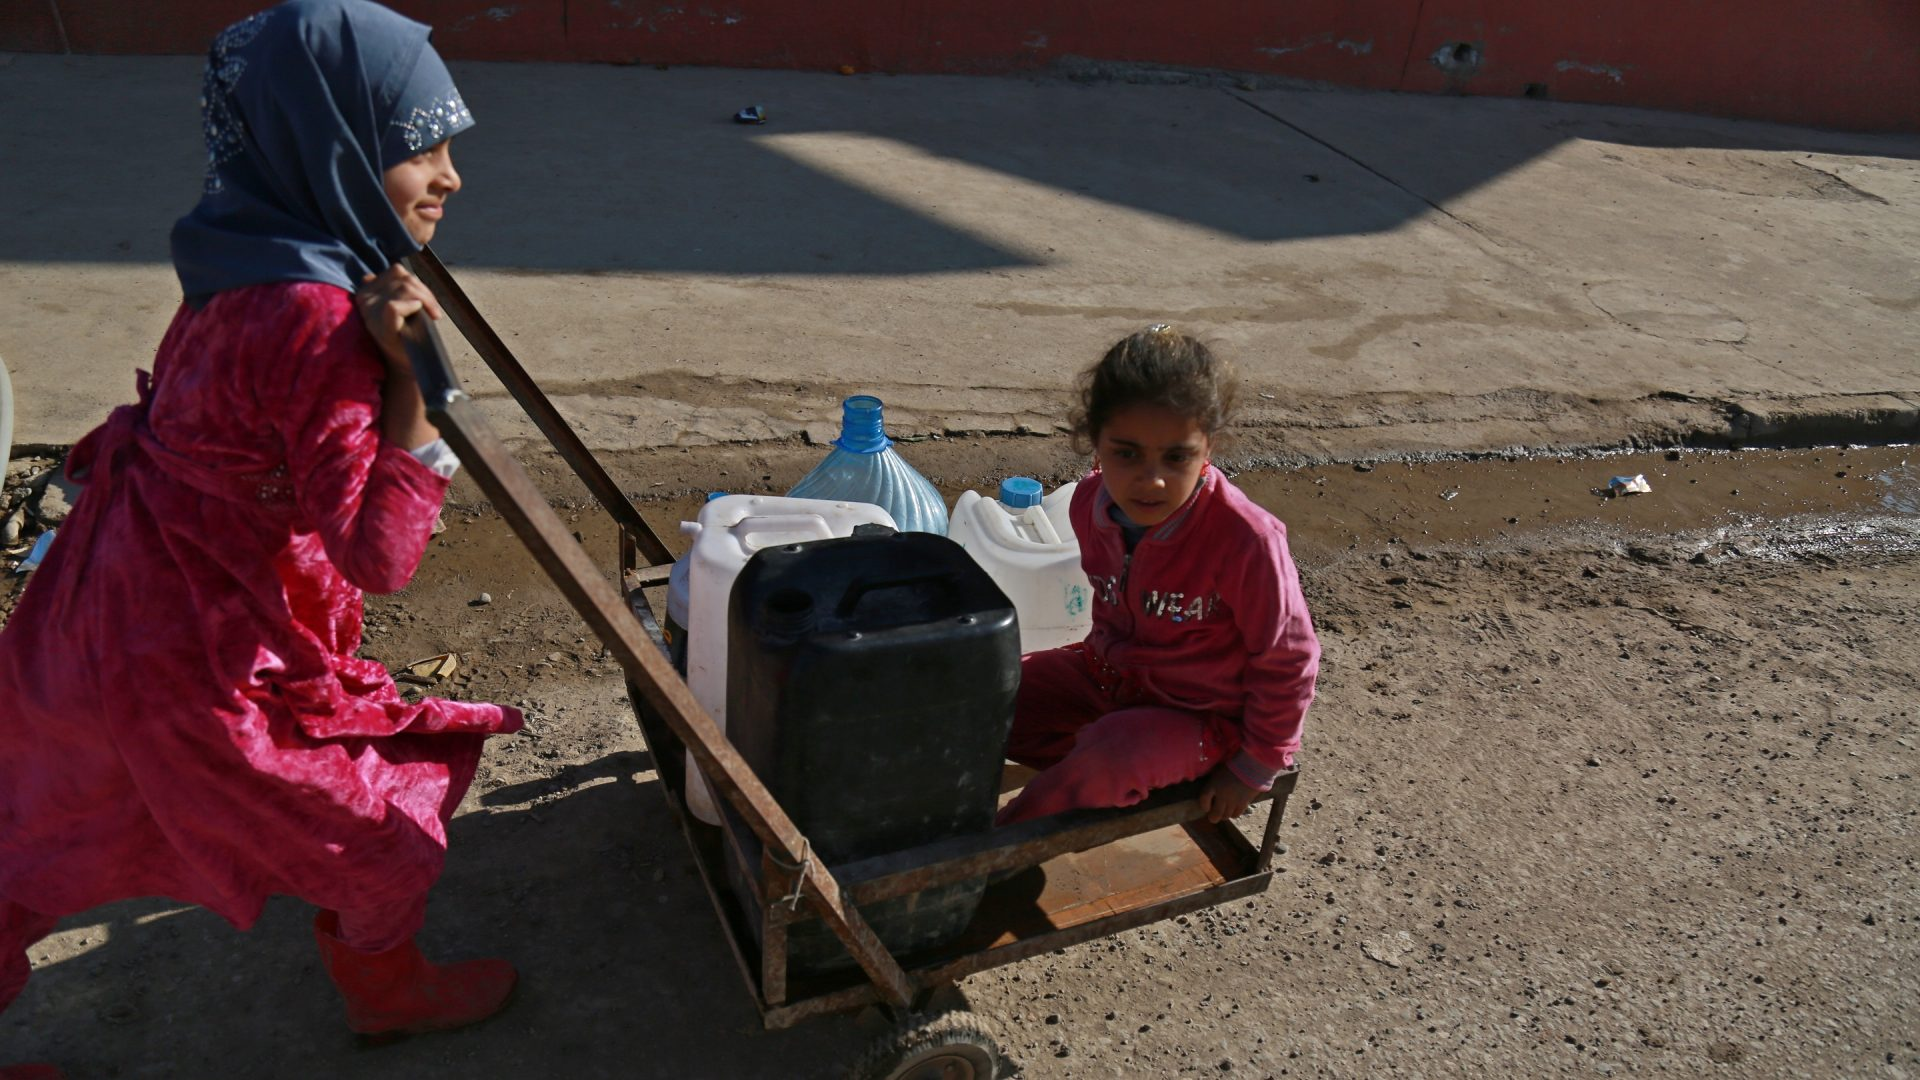 Irak East Mosul 2017 foto Michal Przedlacki